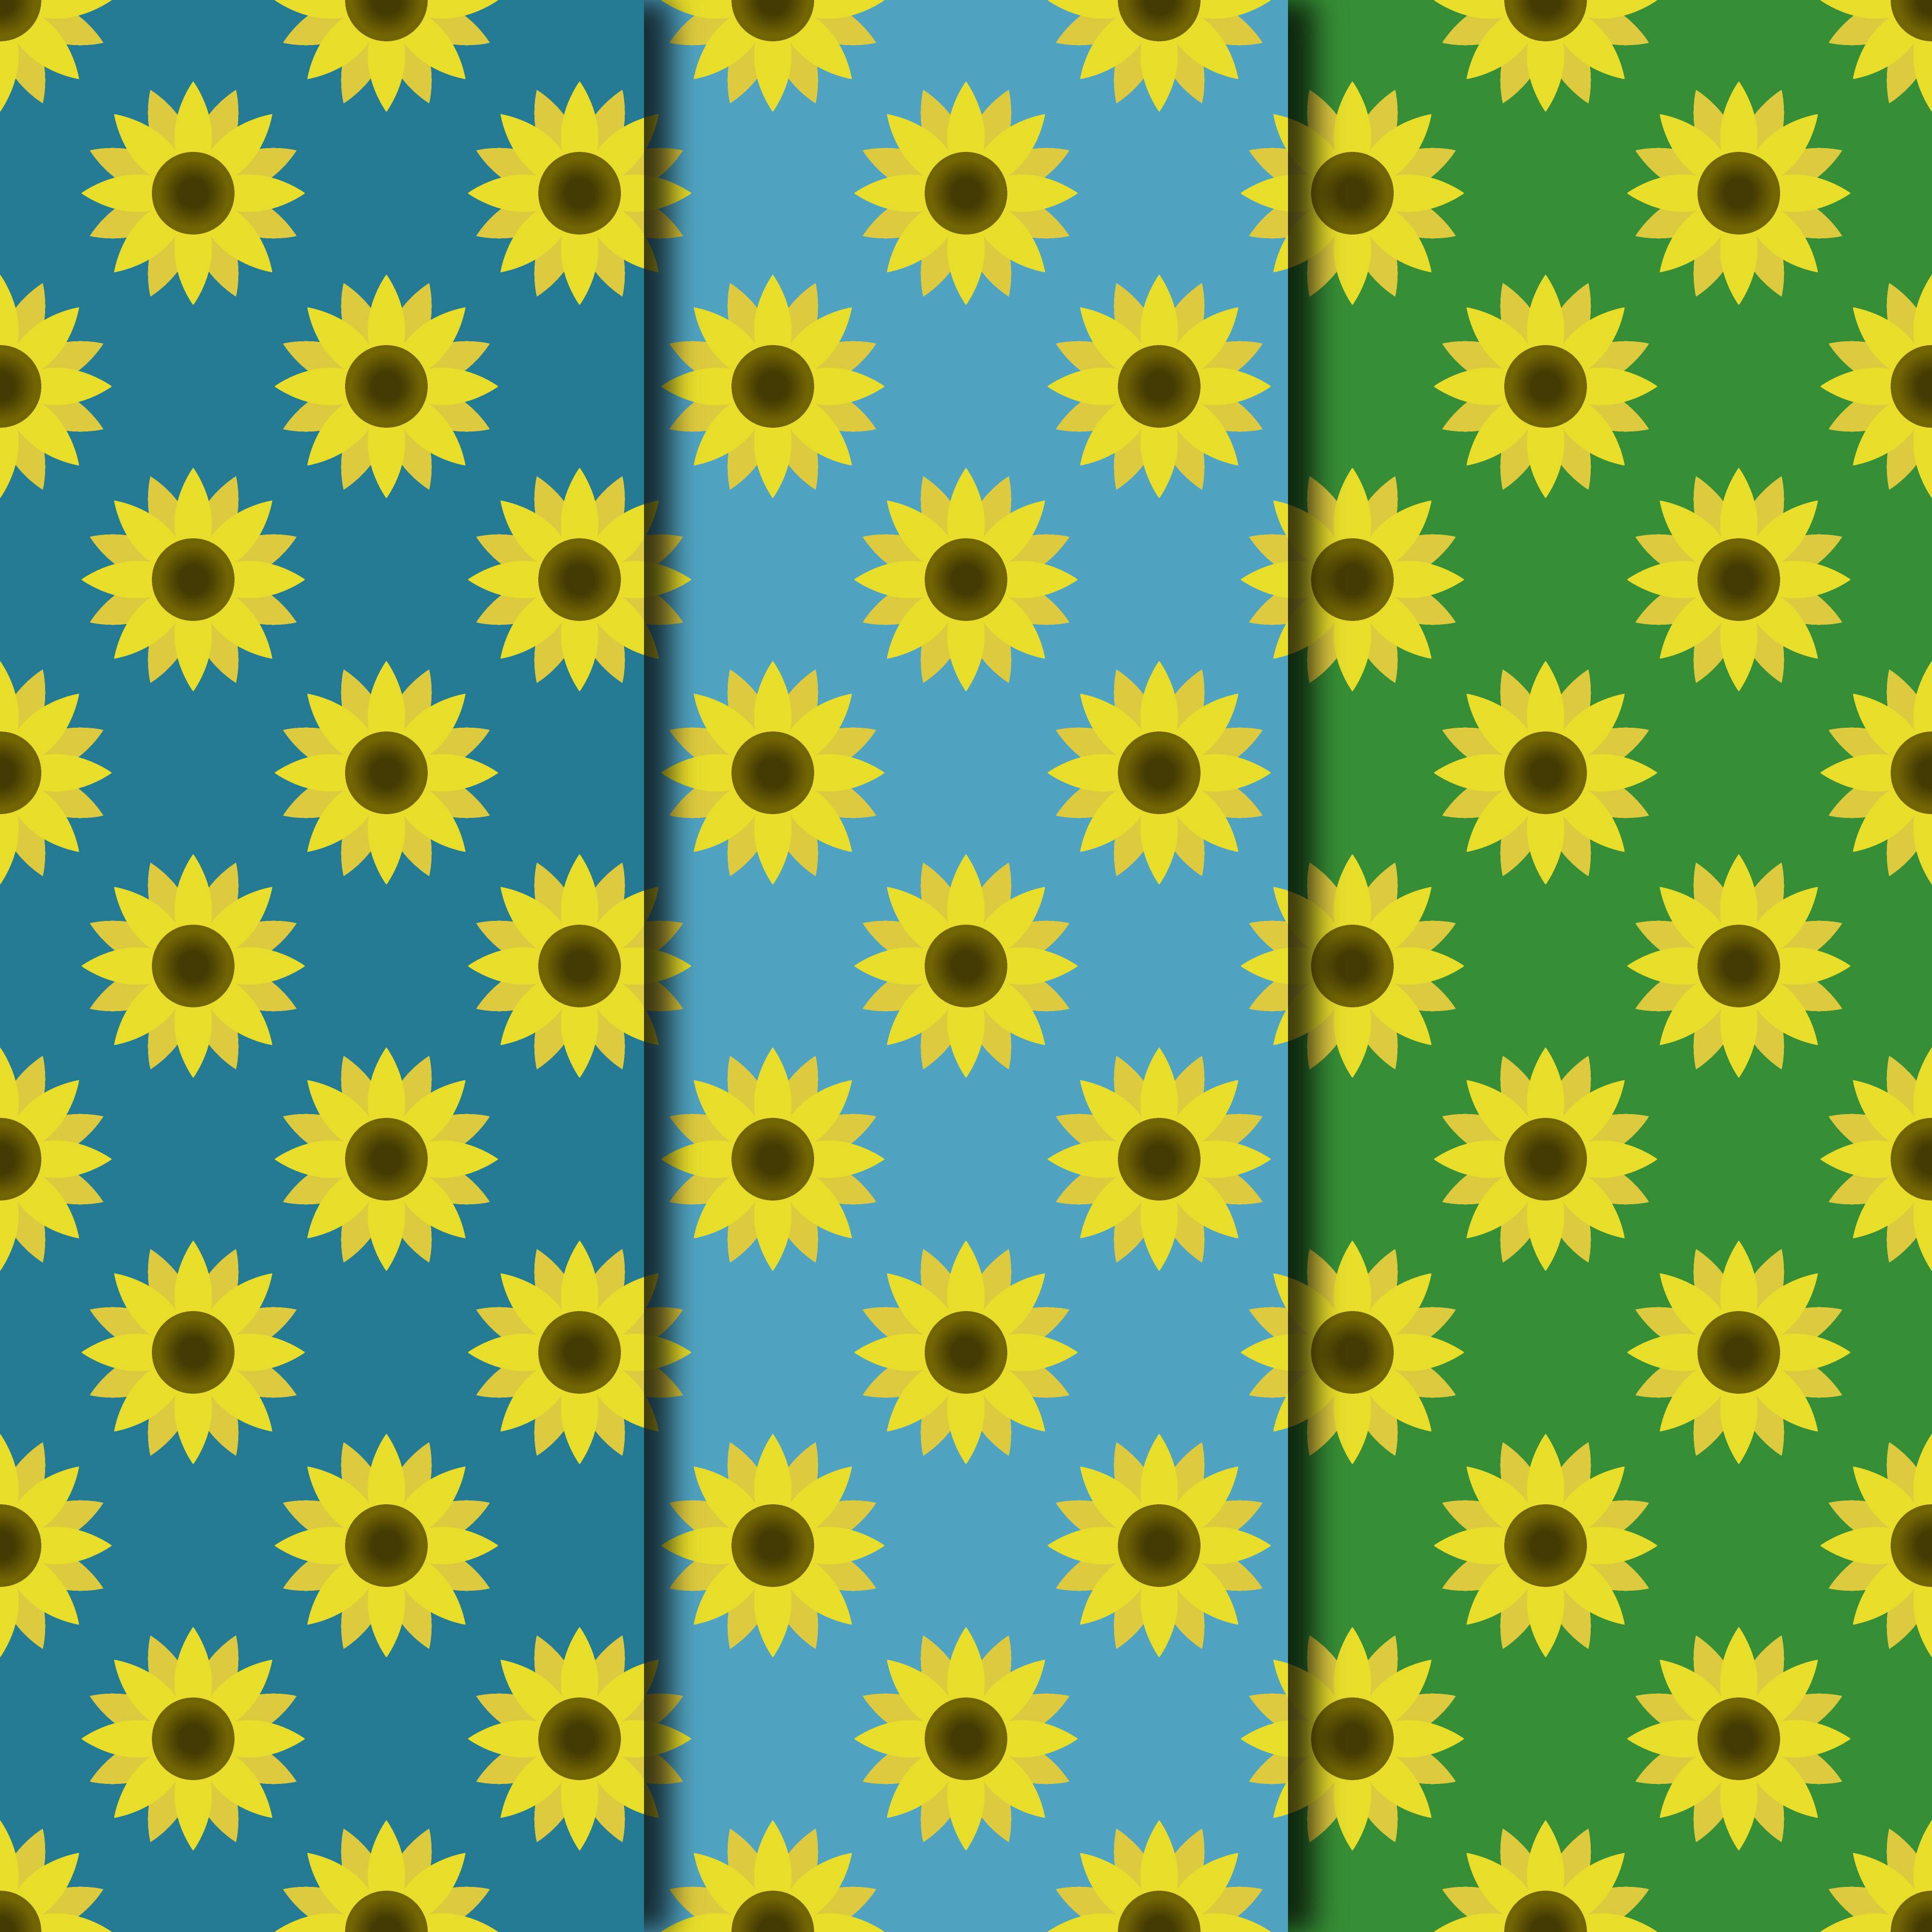 Blooming Sunflowers Digital Paper example image 4